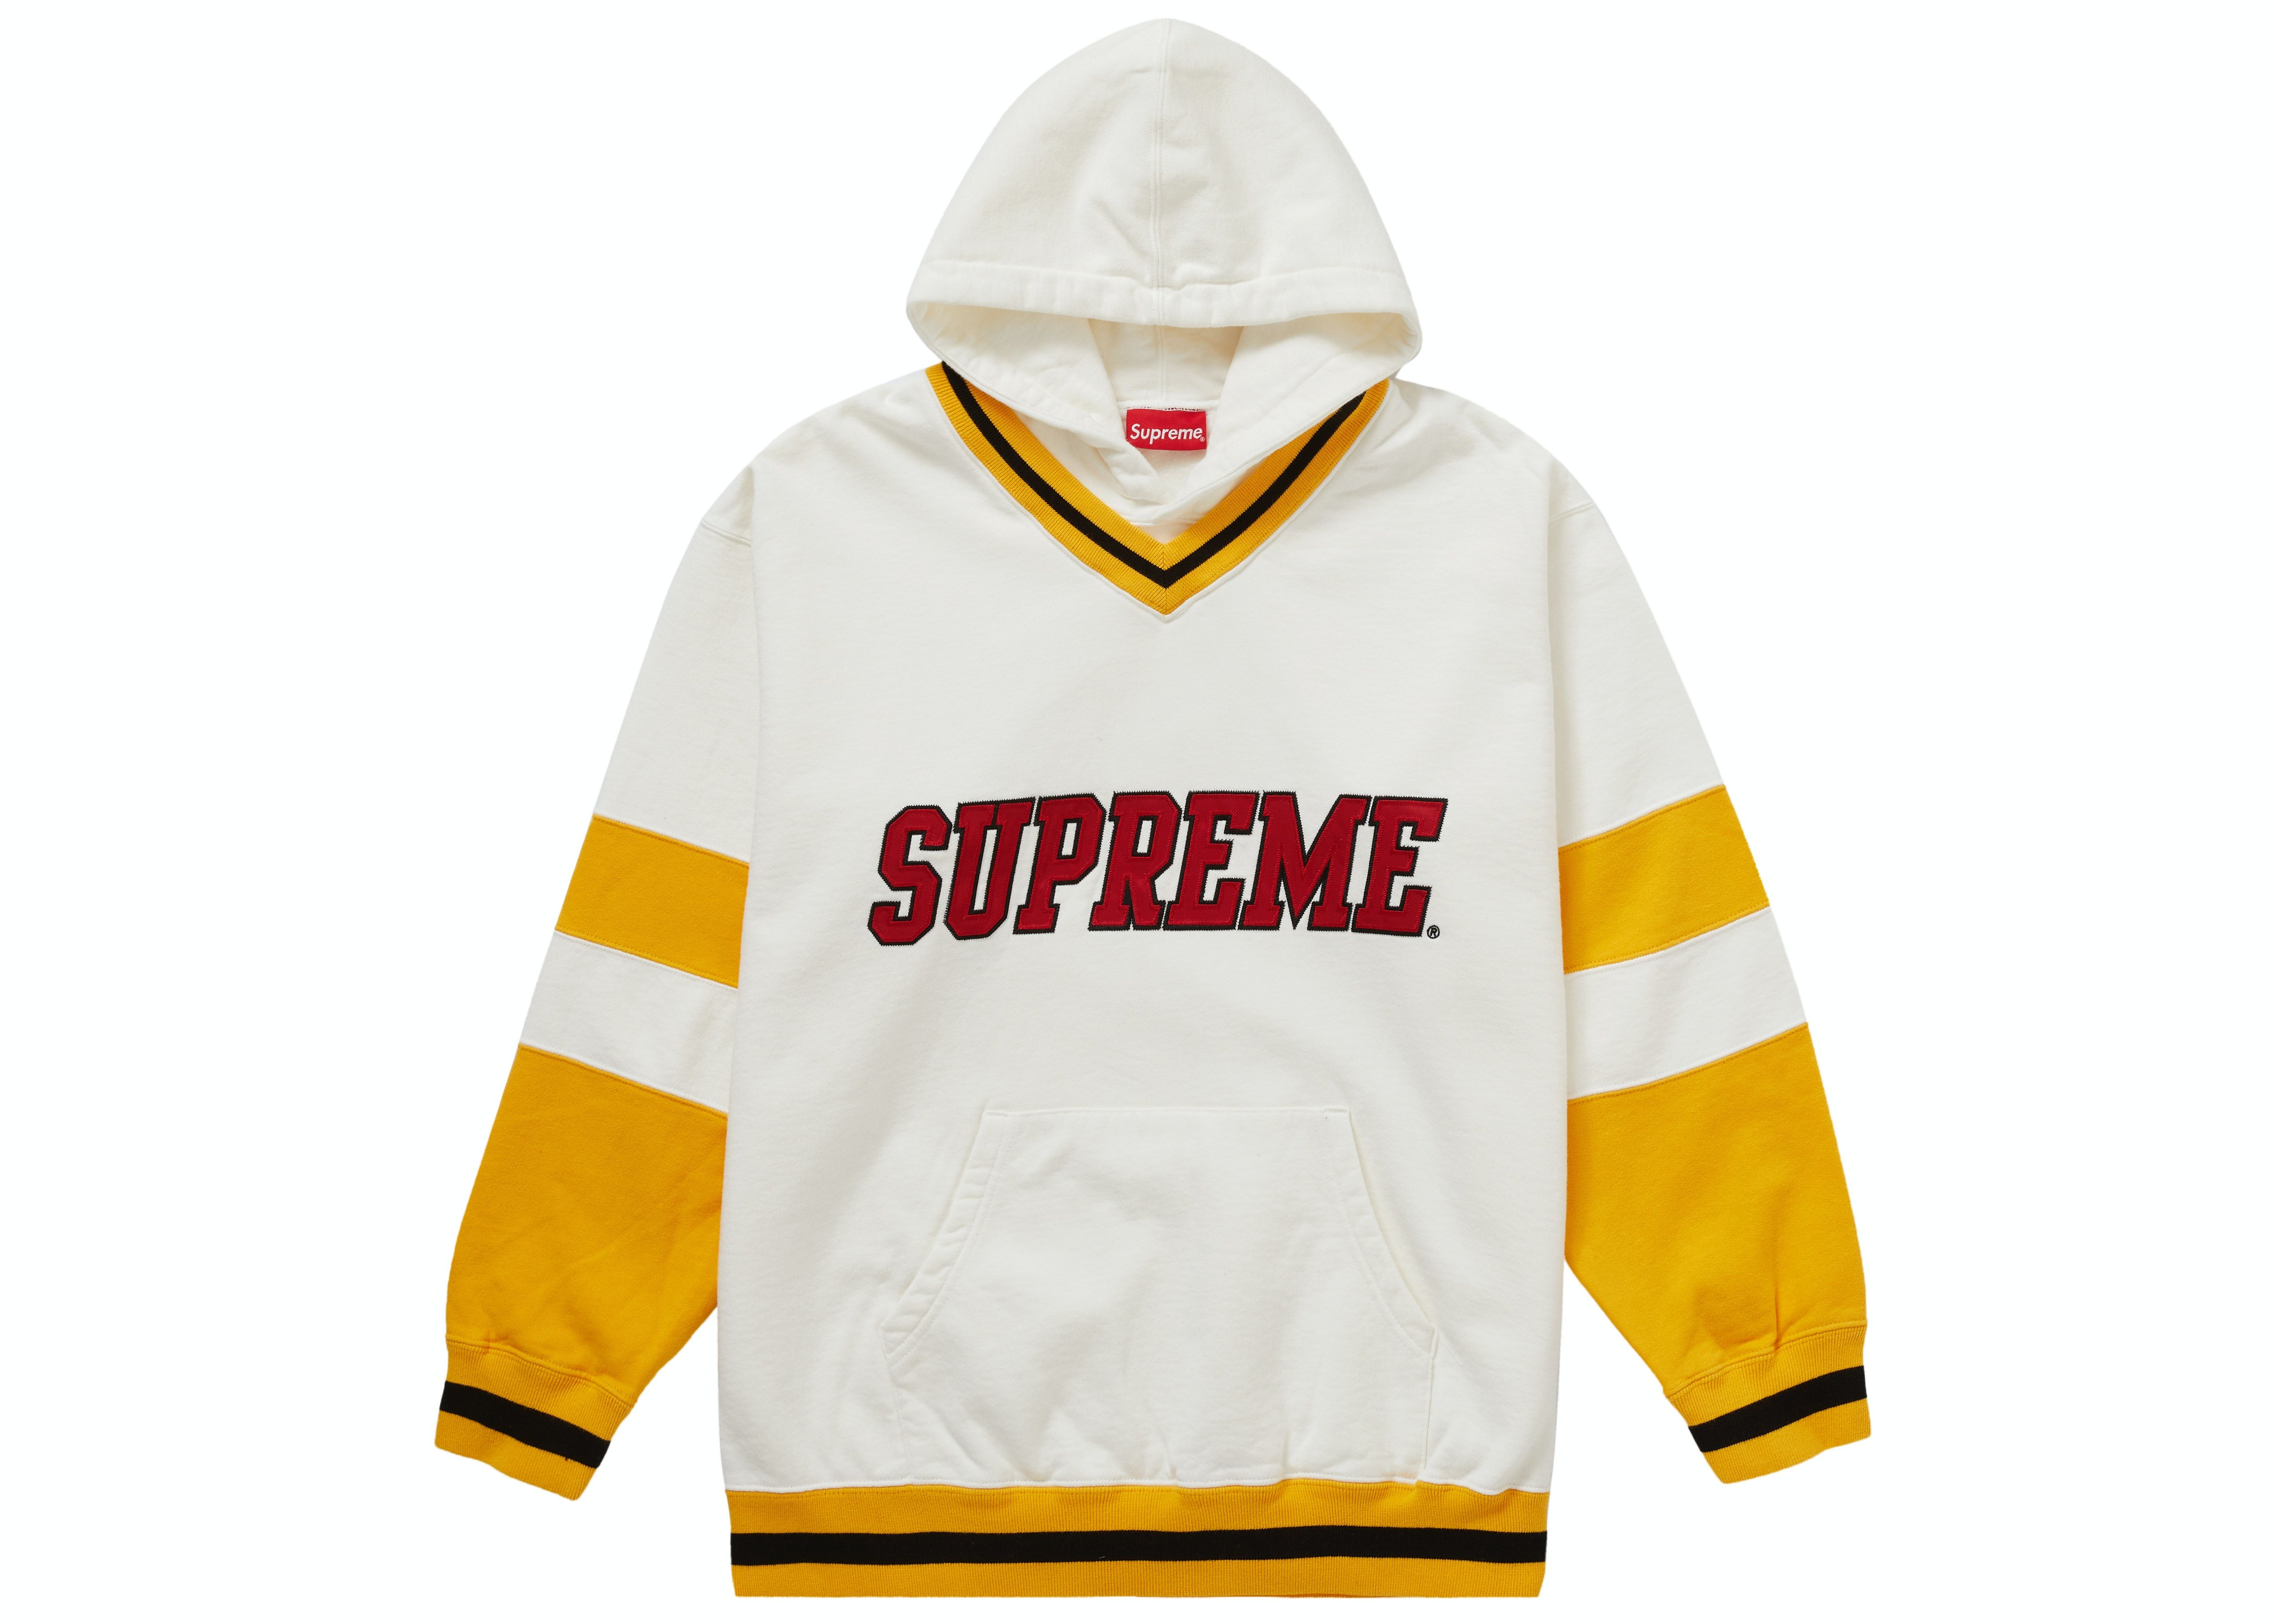 Supreme Hockey Hooded Sweatshirt White In 2021 Sweatshirts Hooded Sweatshirts White Sweatshirt [ 3632 x 5085 Pixel ]